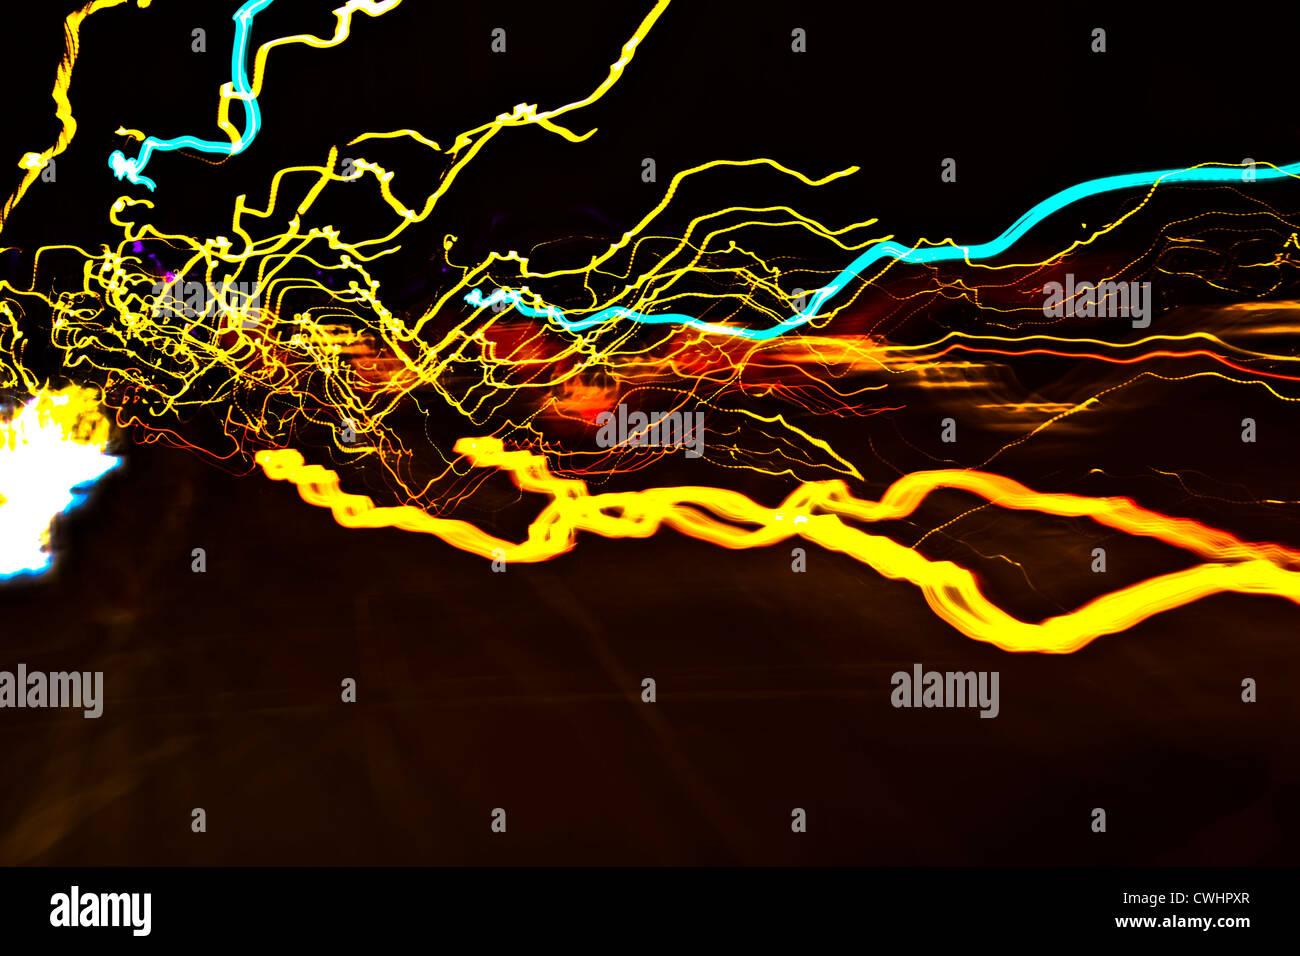 Lampade,abstract,via lighting Immagini Stock